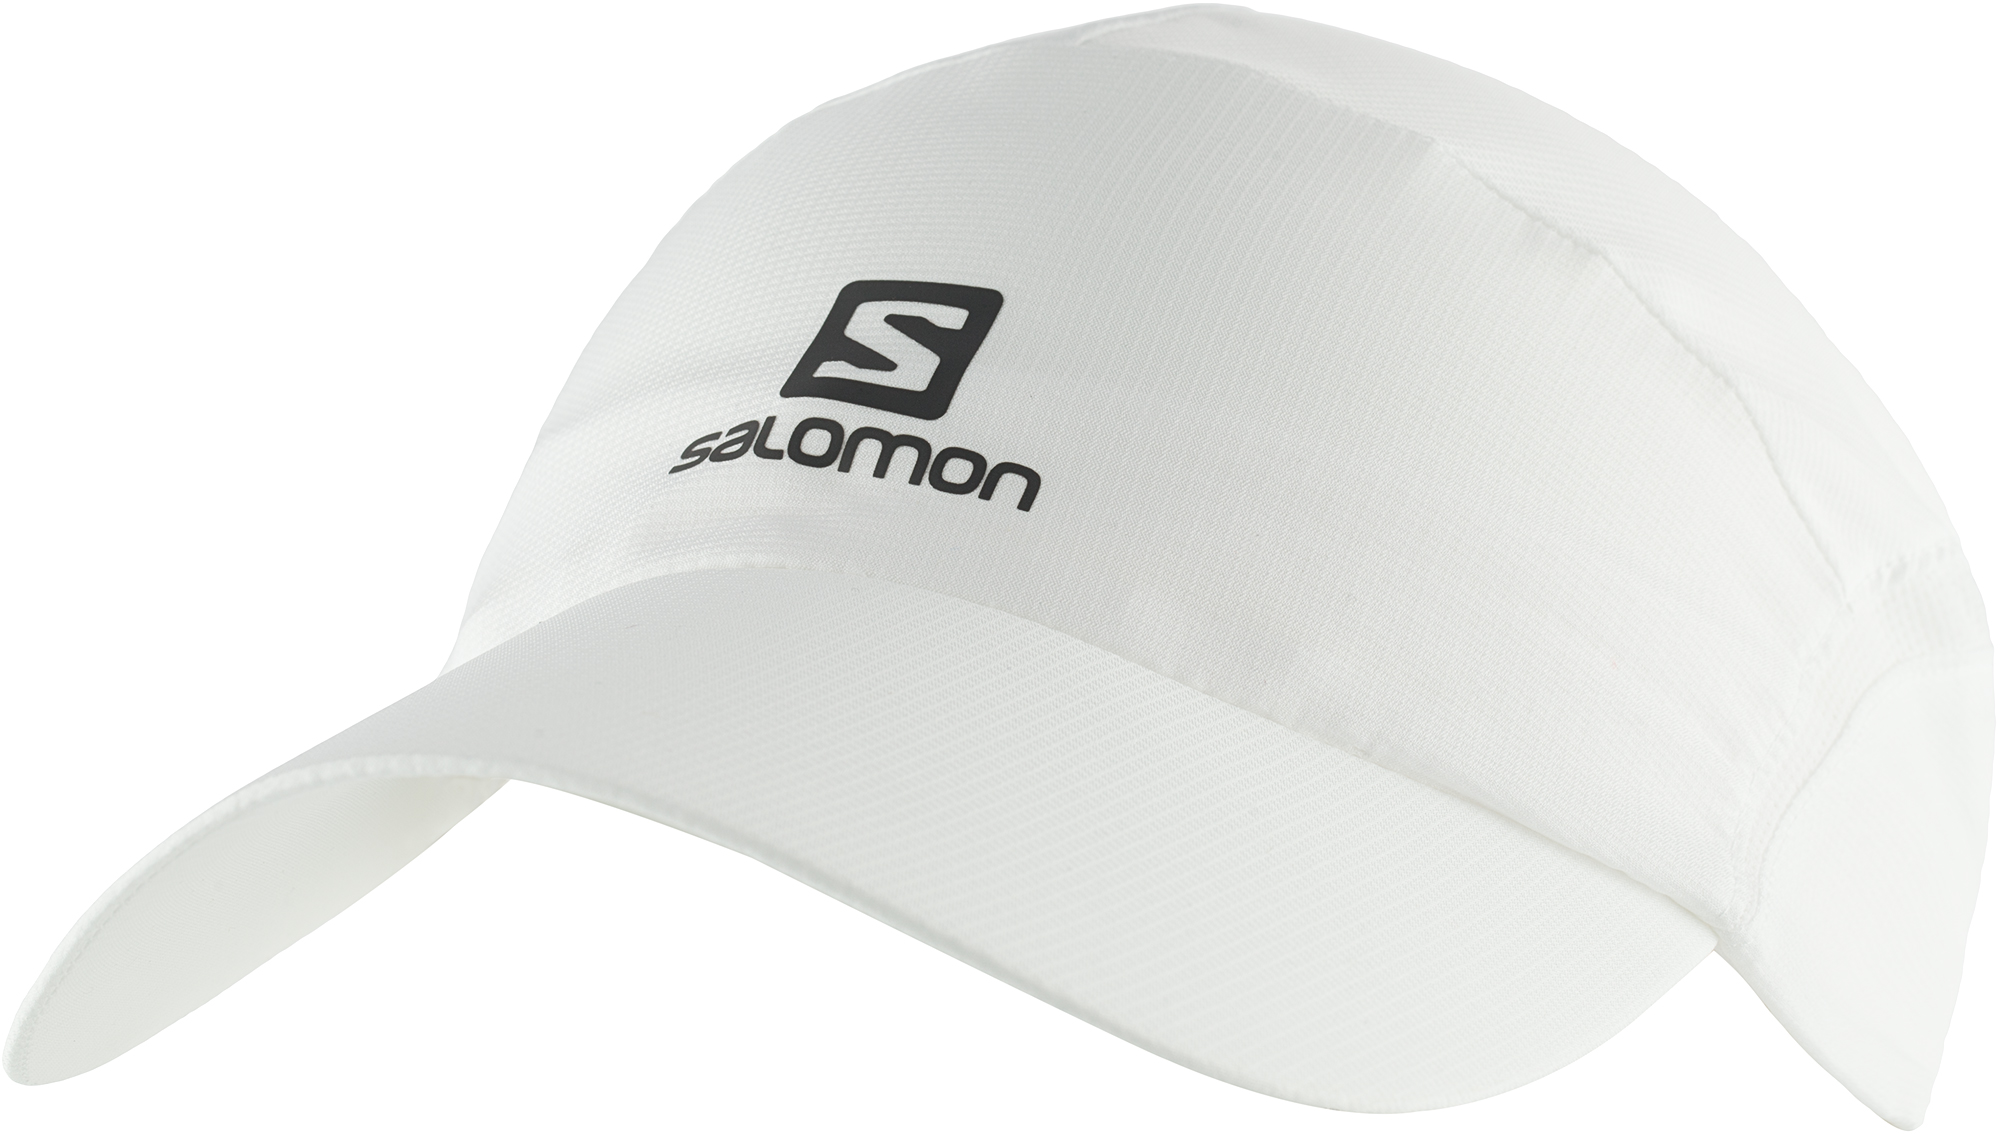 Salomon Бейсболка Xa, размер 59-61